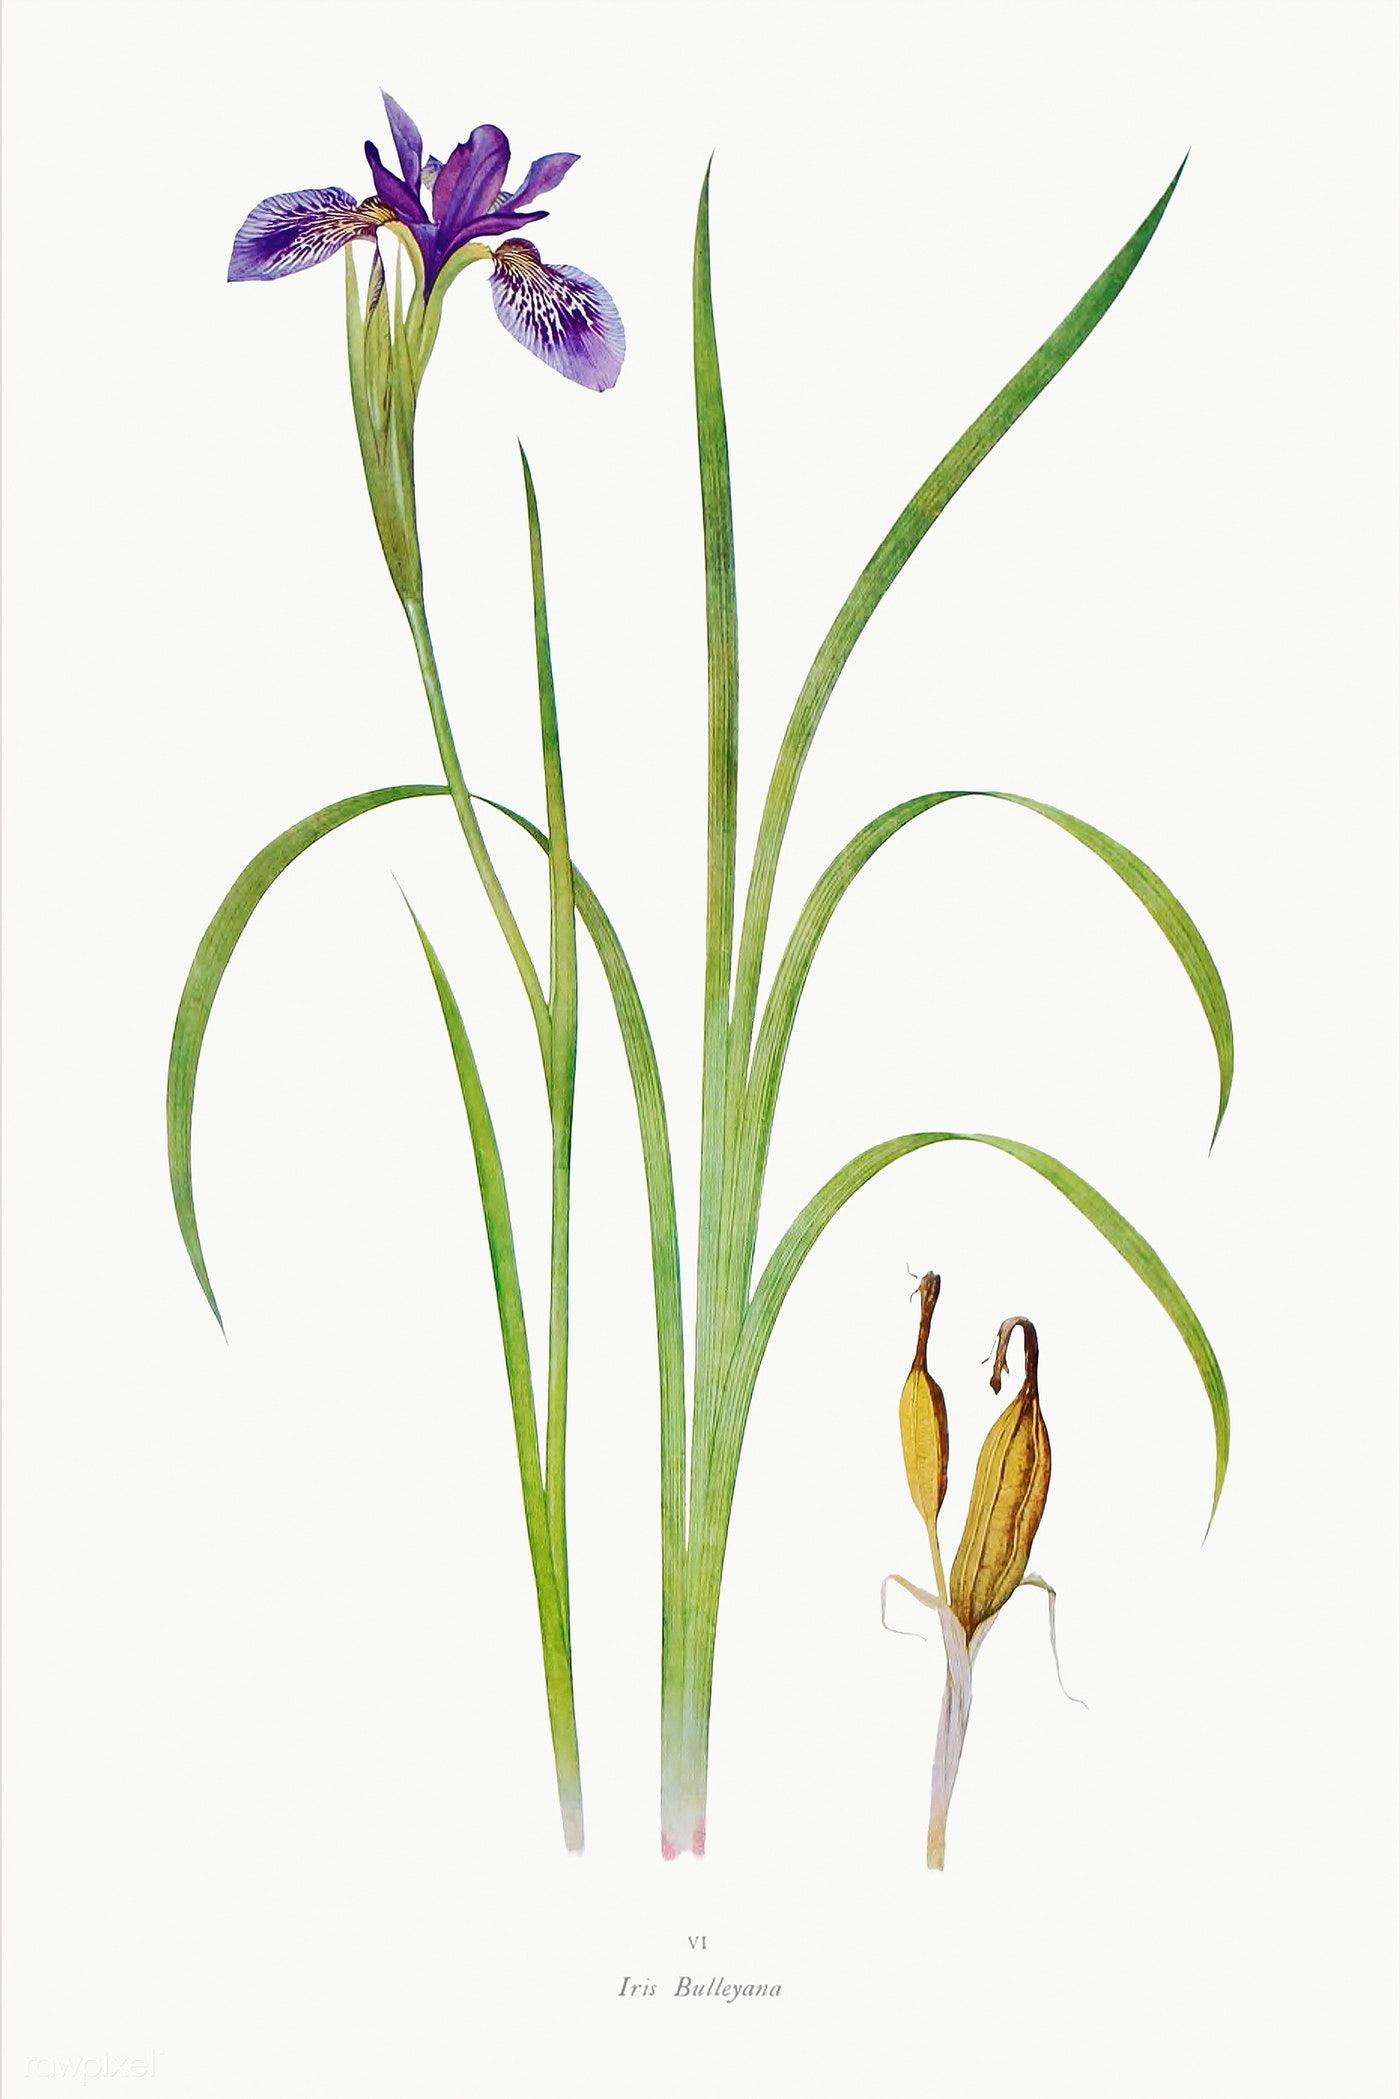 Download Premium Illustration Of Vintage Iris Flower Illustration Template In 2020 Flower Illustration Iris Flowers Plant Illustration